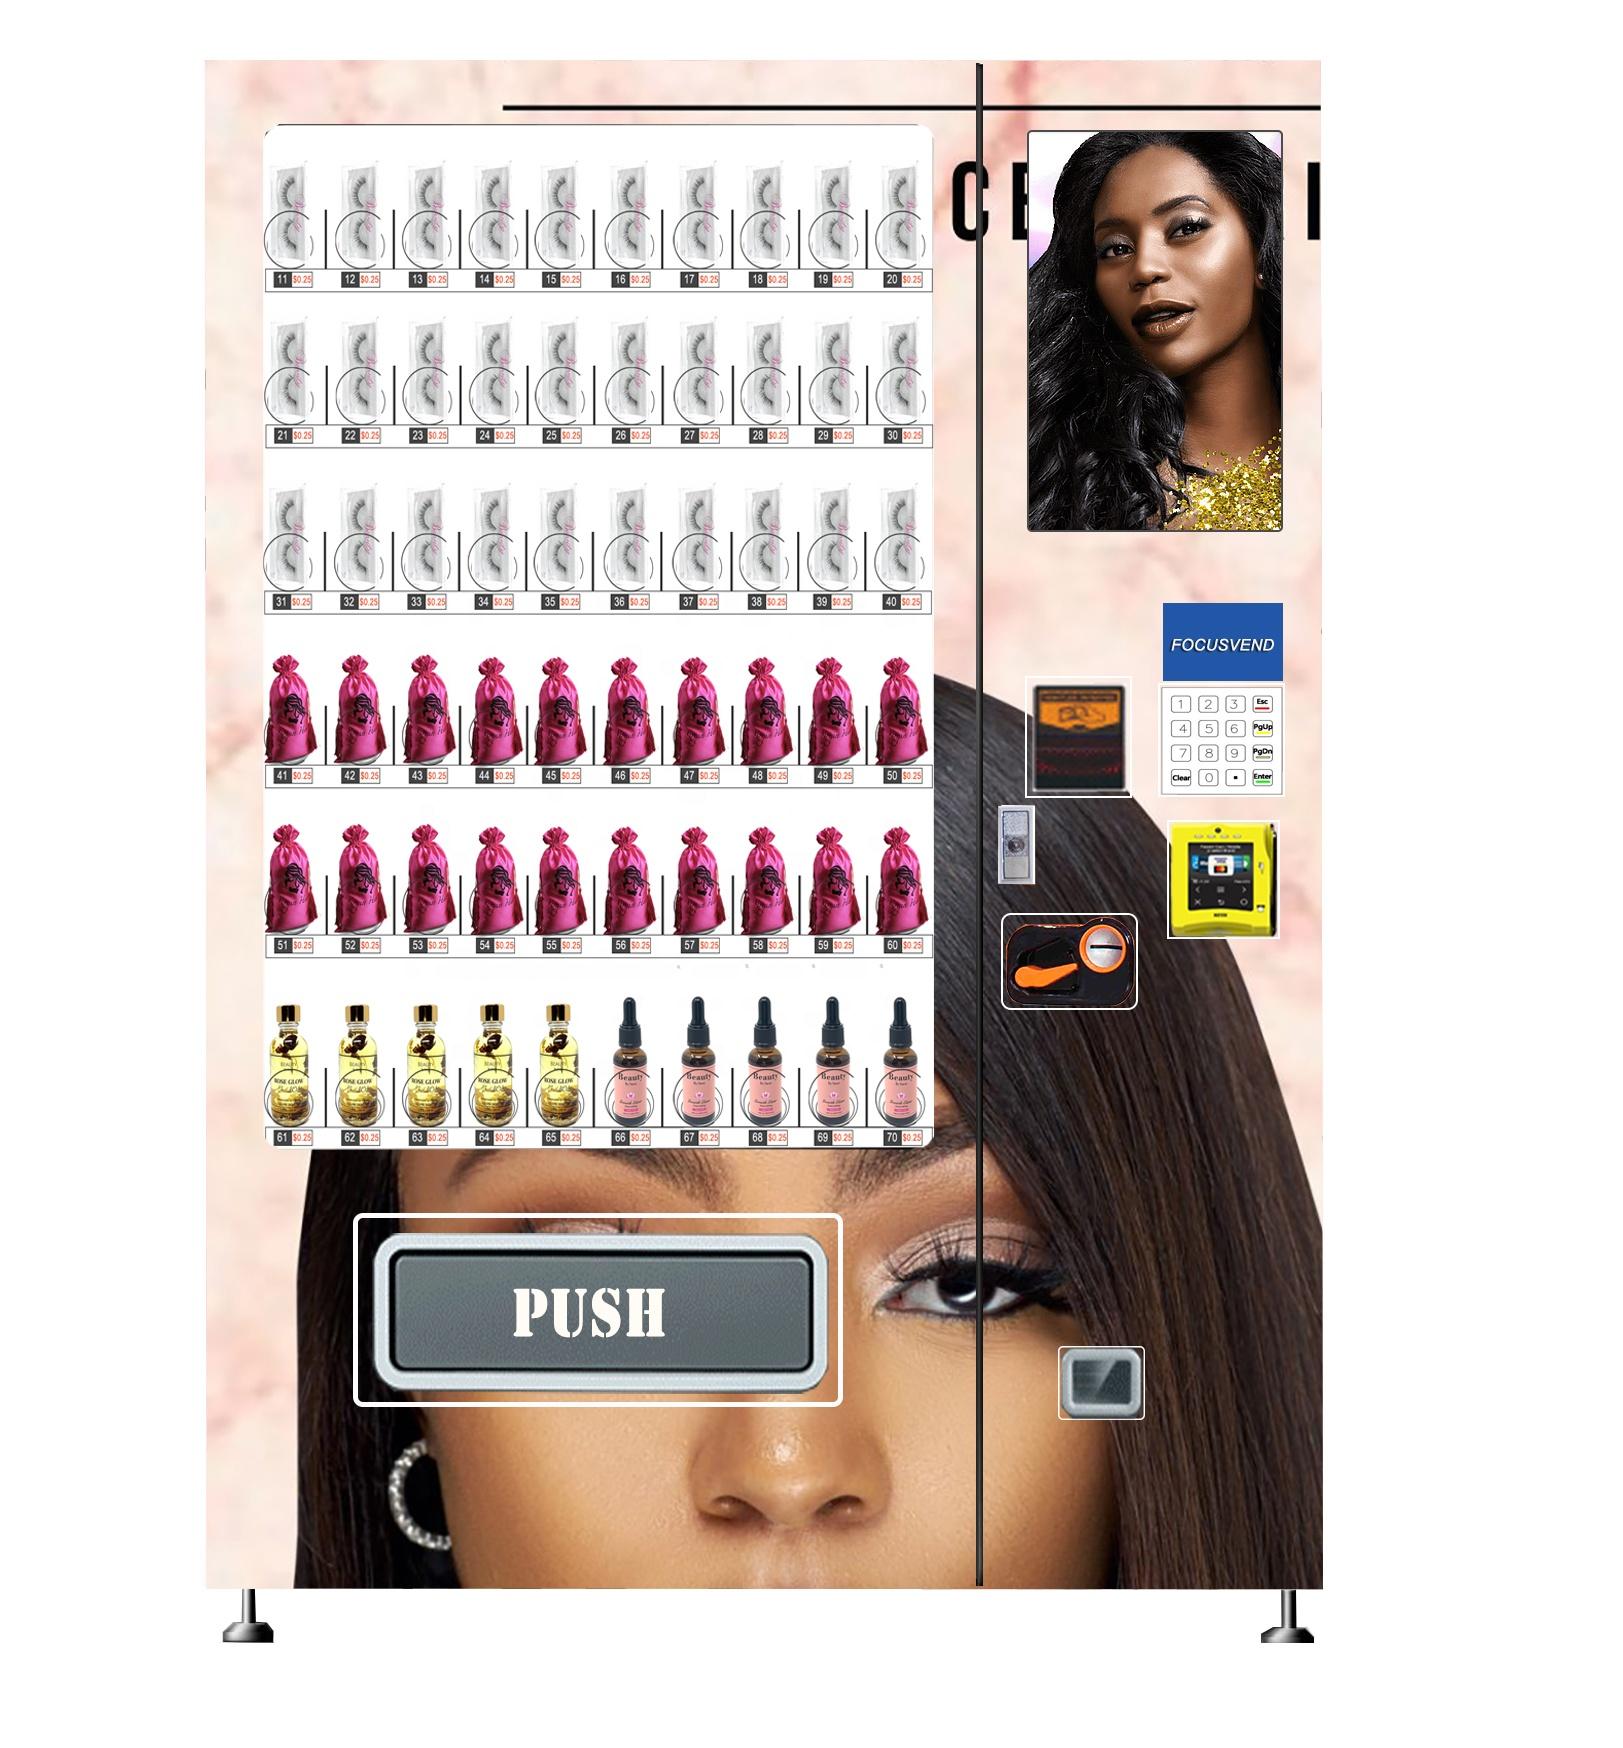 Best seller lash vending machine with free customized desgin wrap